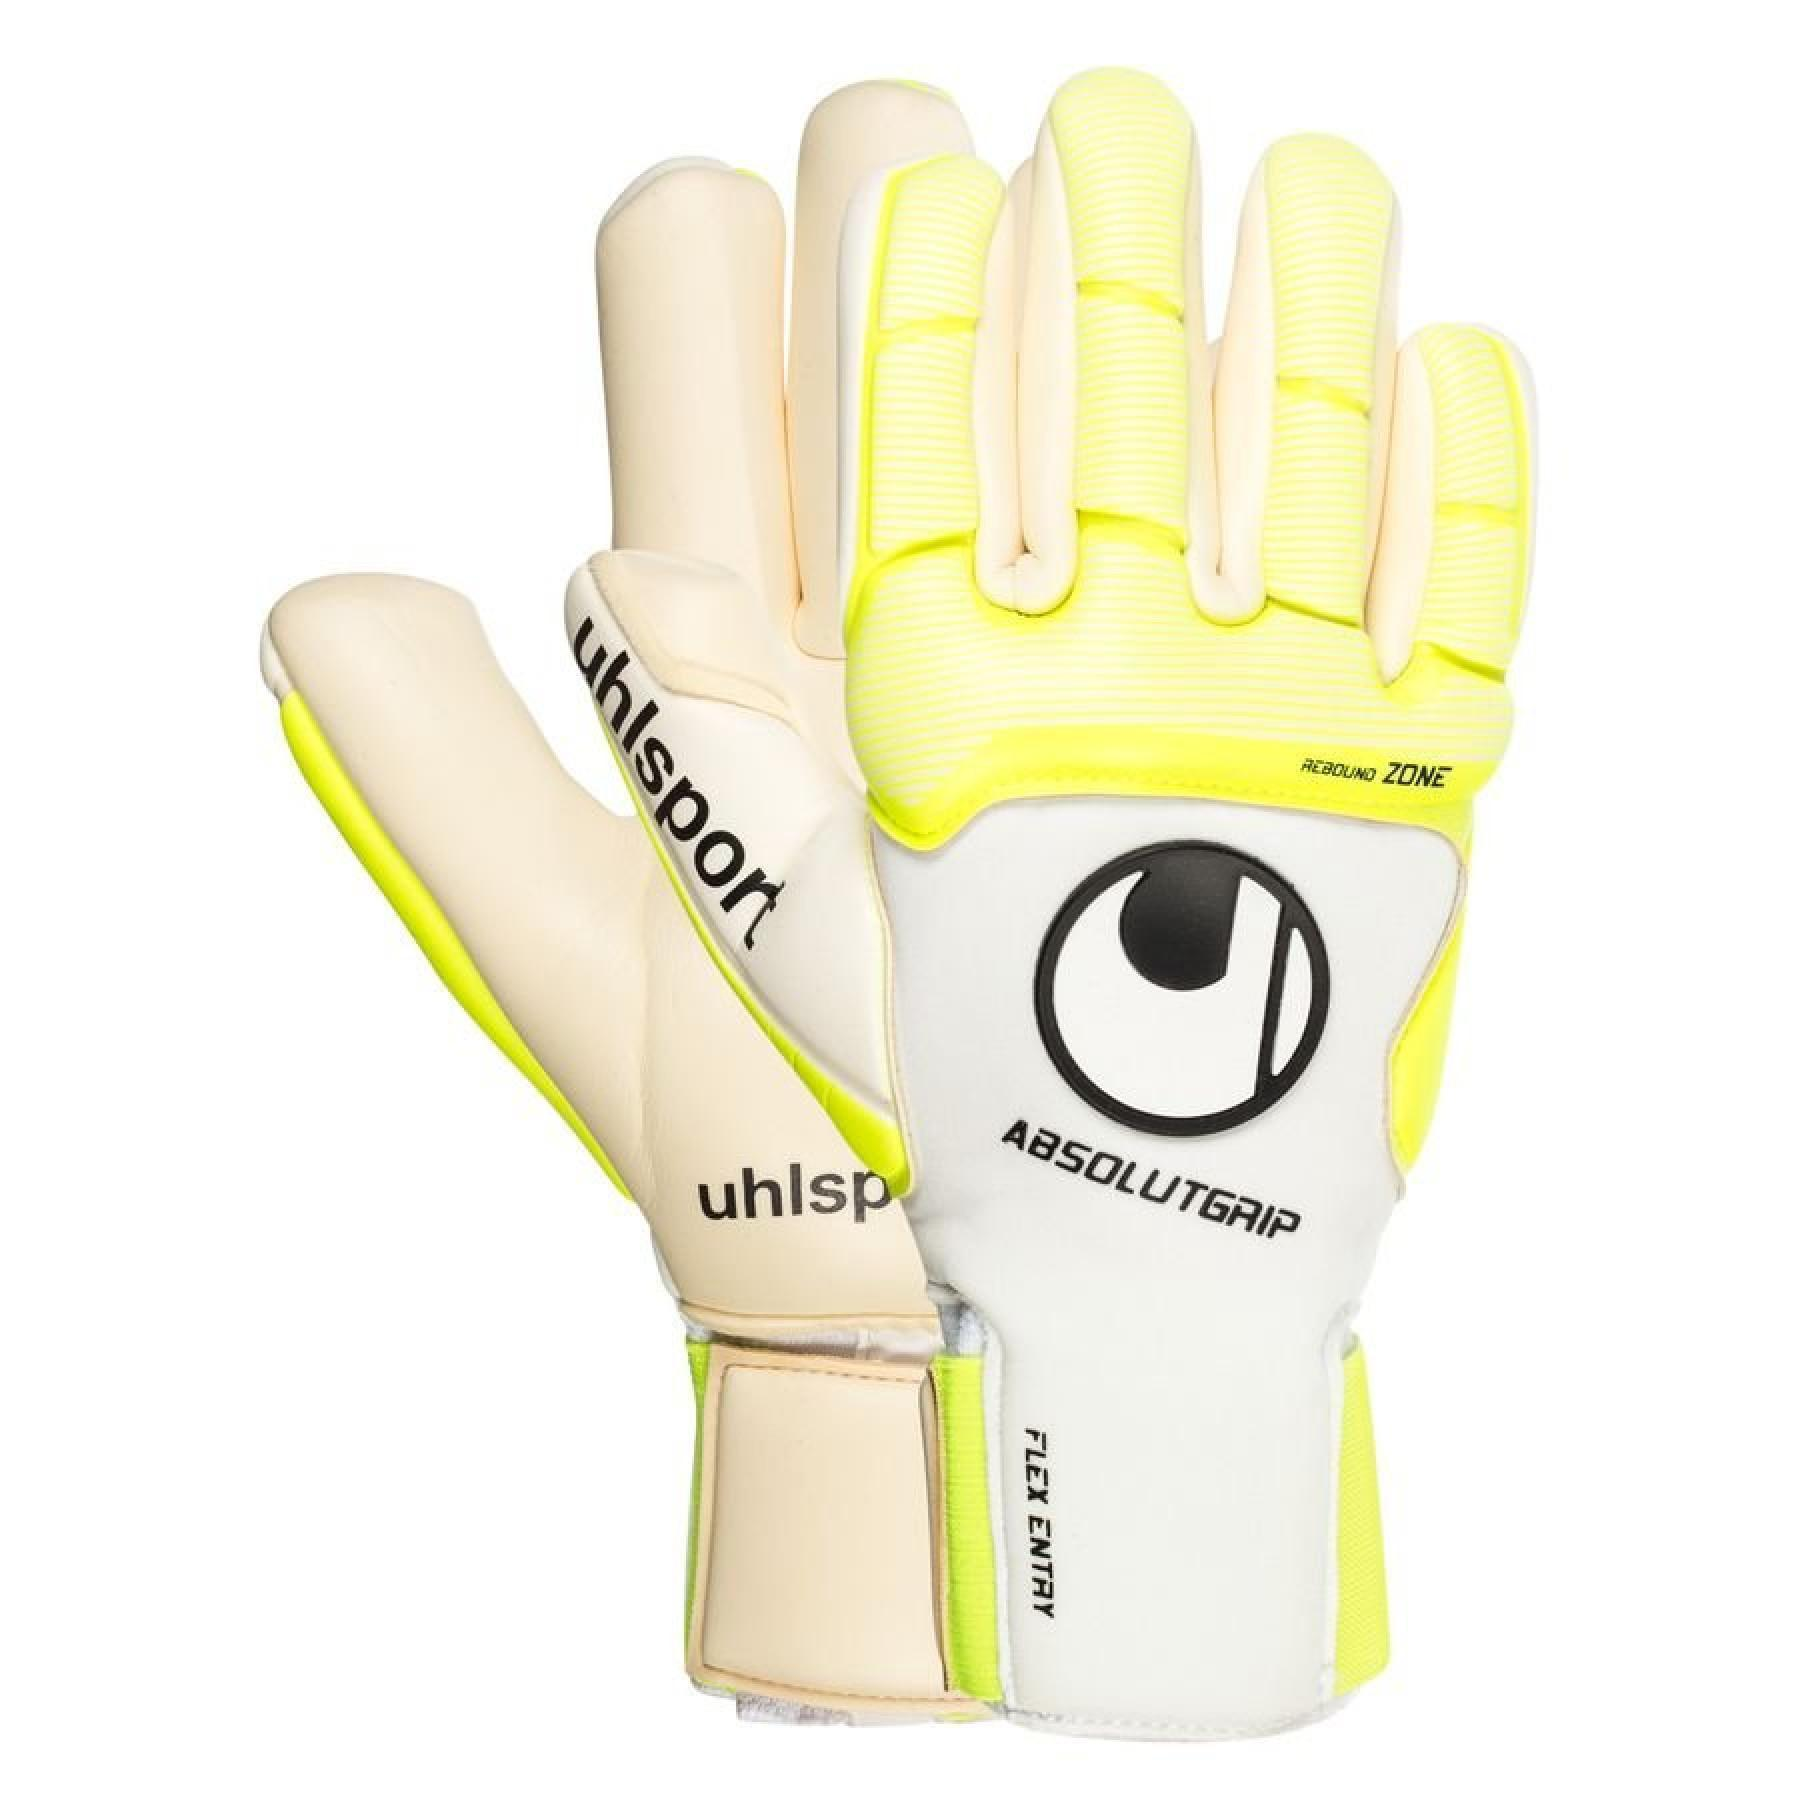 Gants Uhlsport Pure Alliance AbsolutGrip Finger Surround